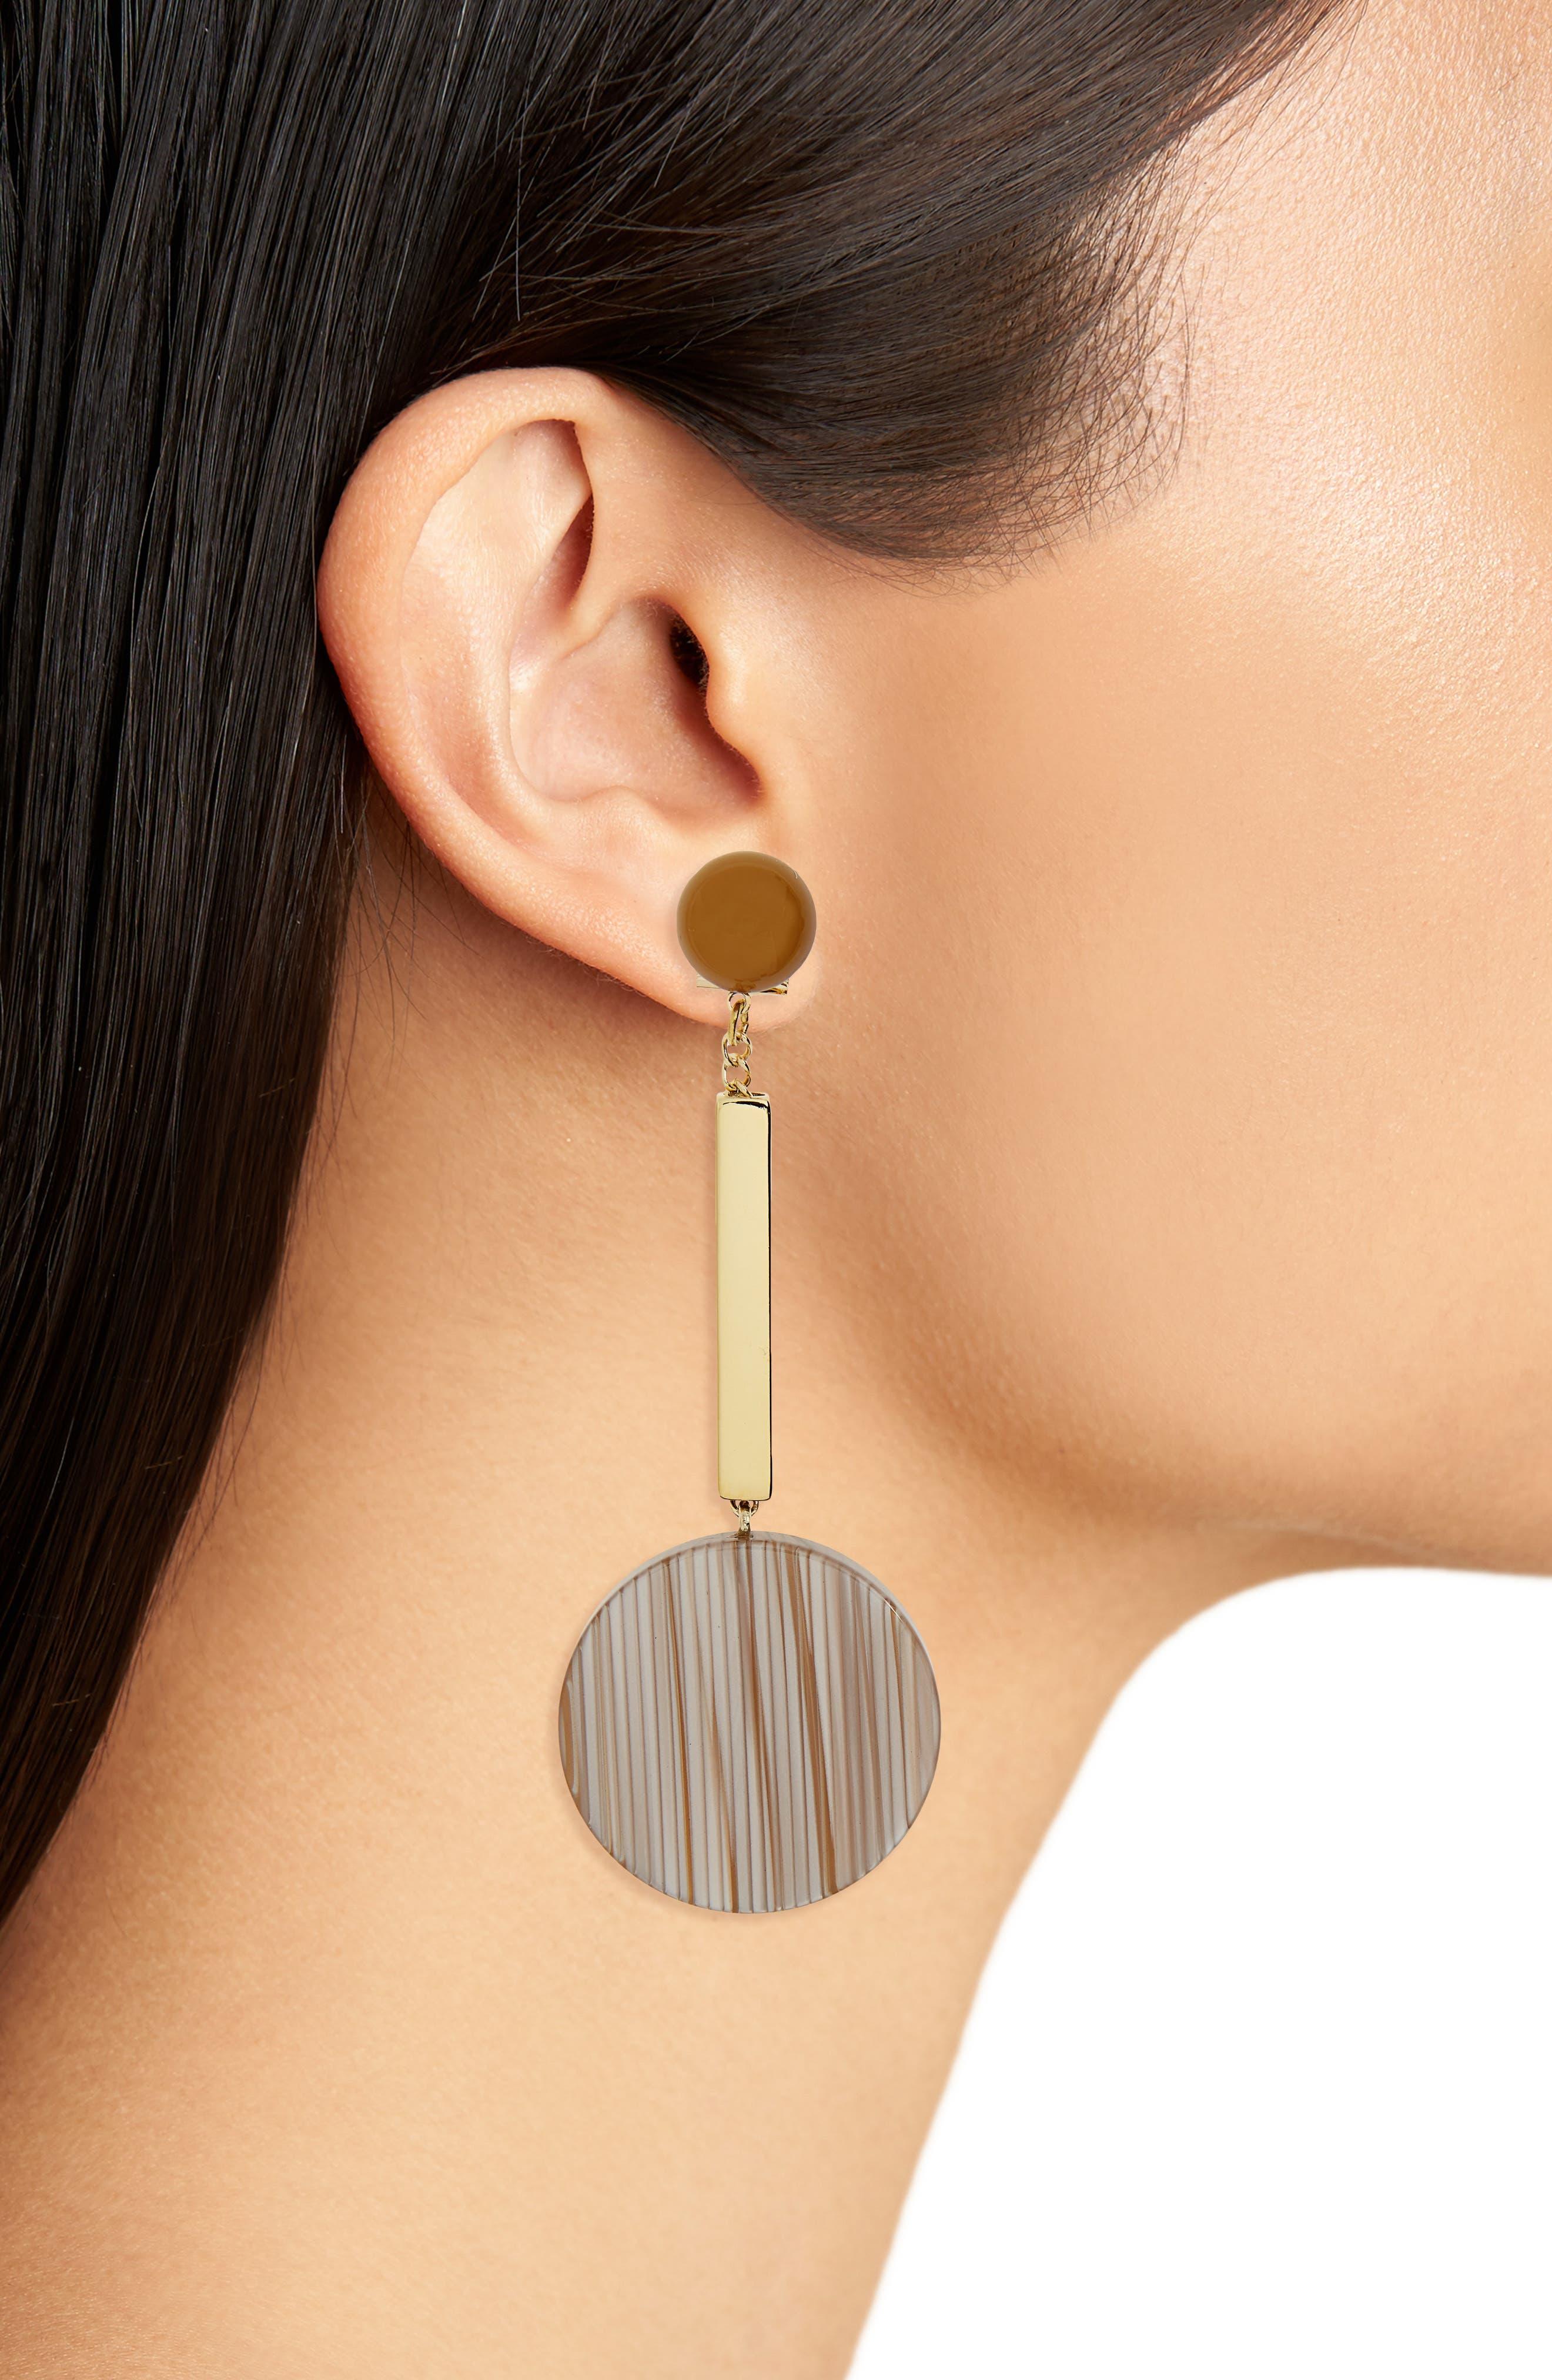 Jo Drop Earrings,                             Alternate thumbnail 2, color,                             710